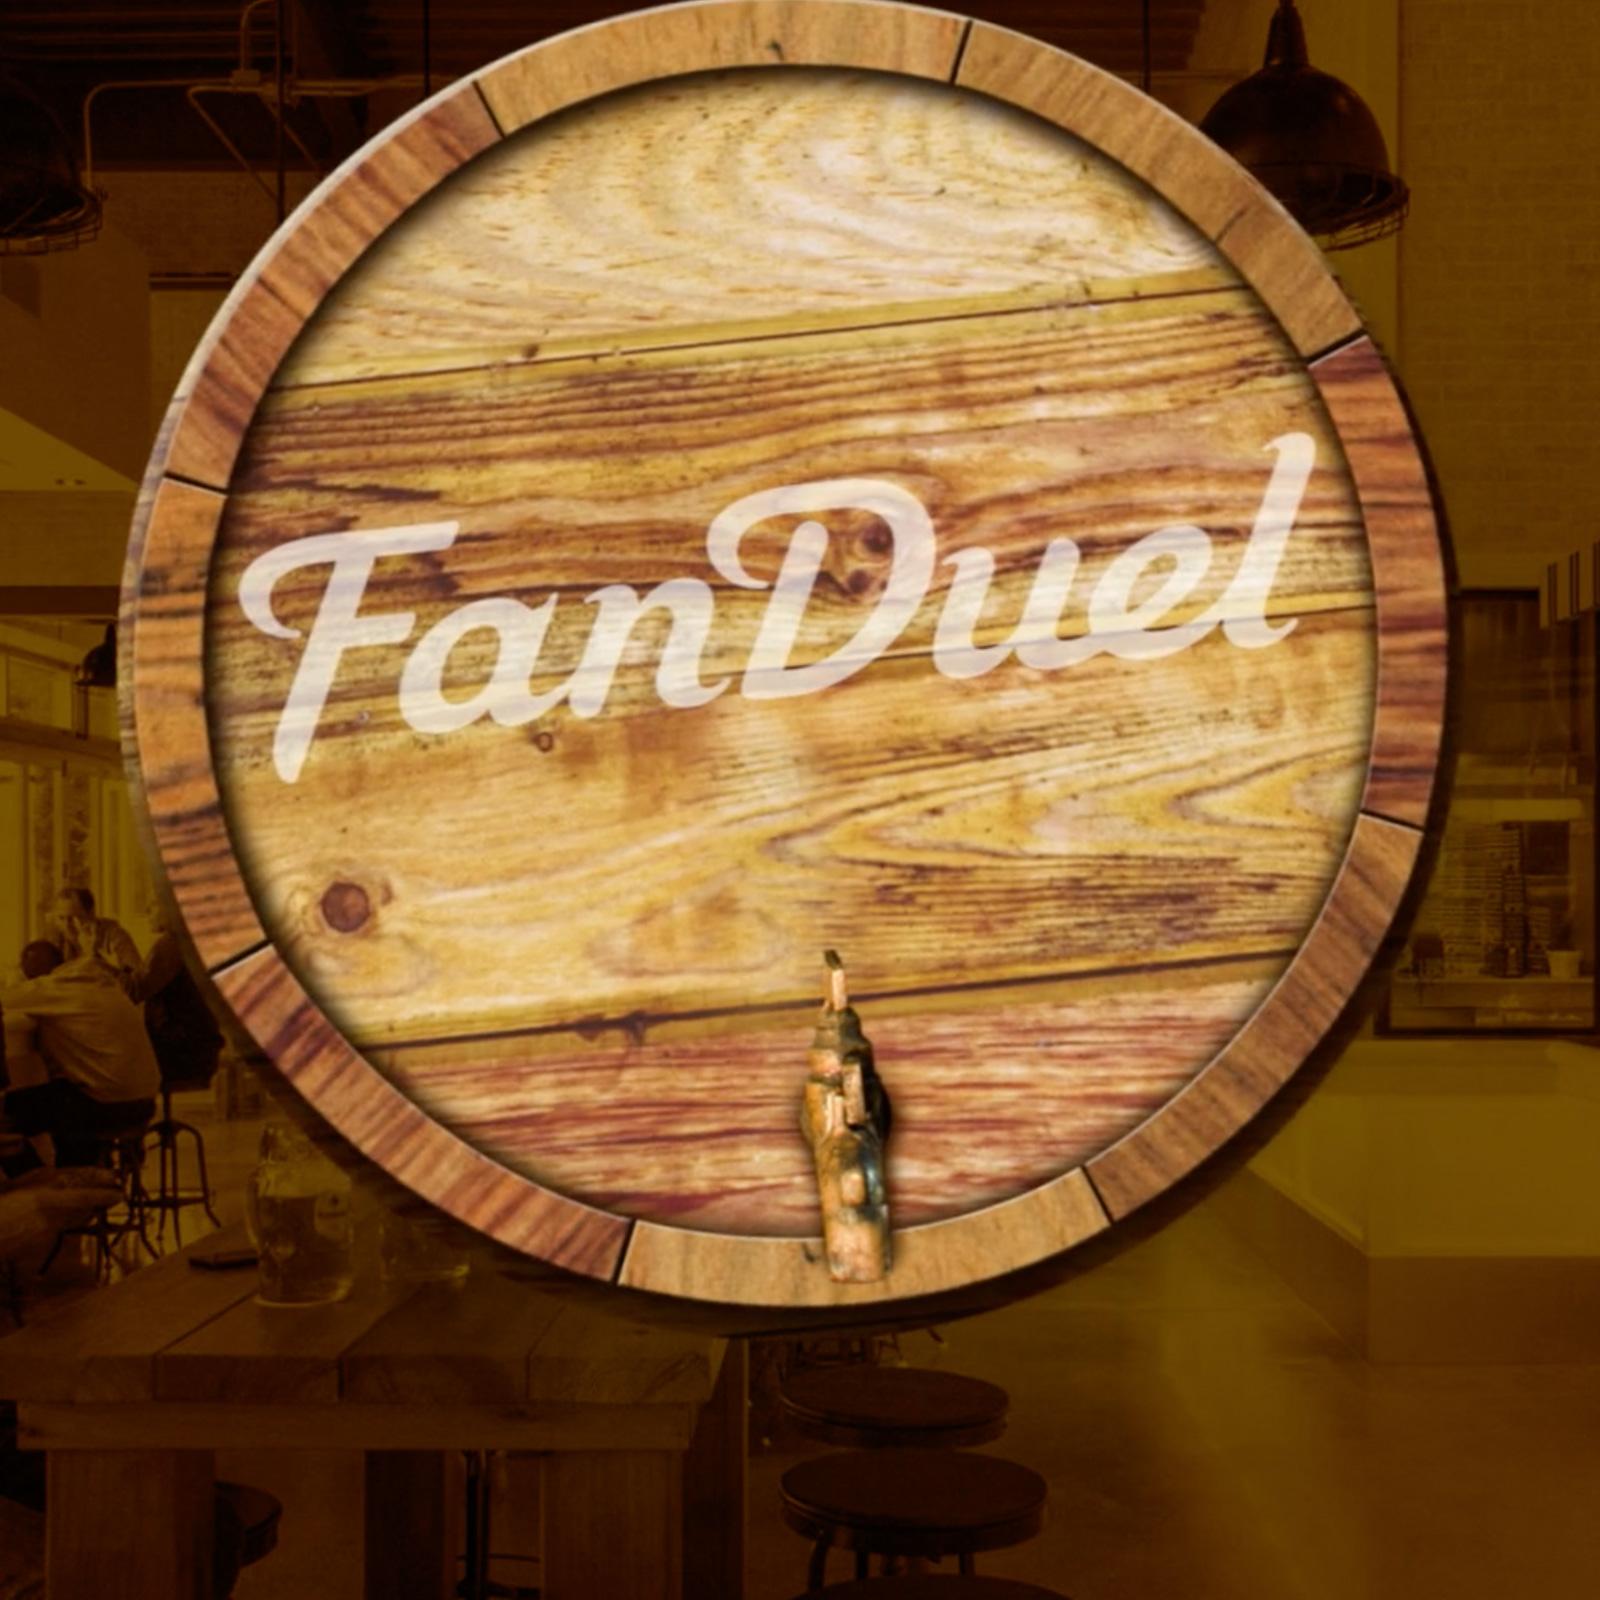 Fanduel Digital Signage